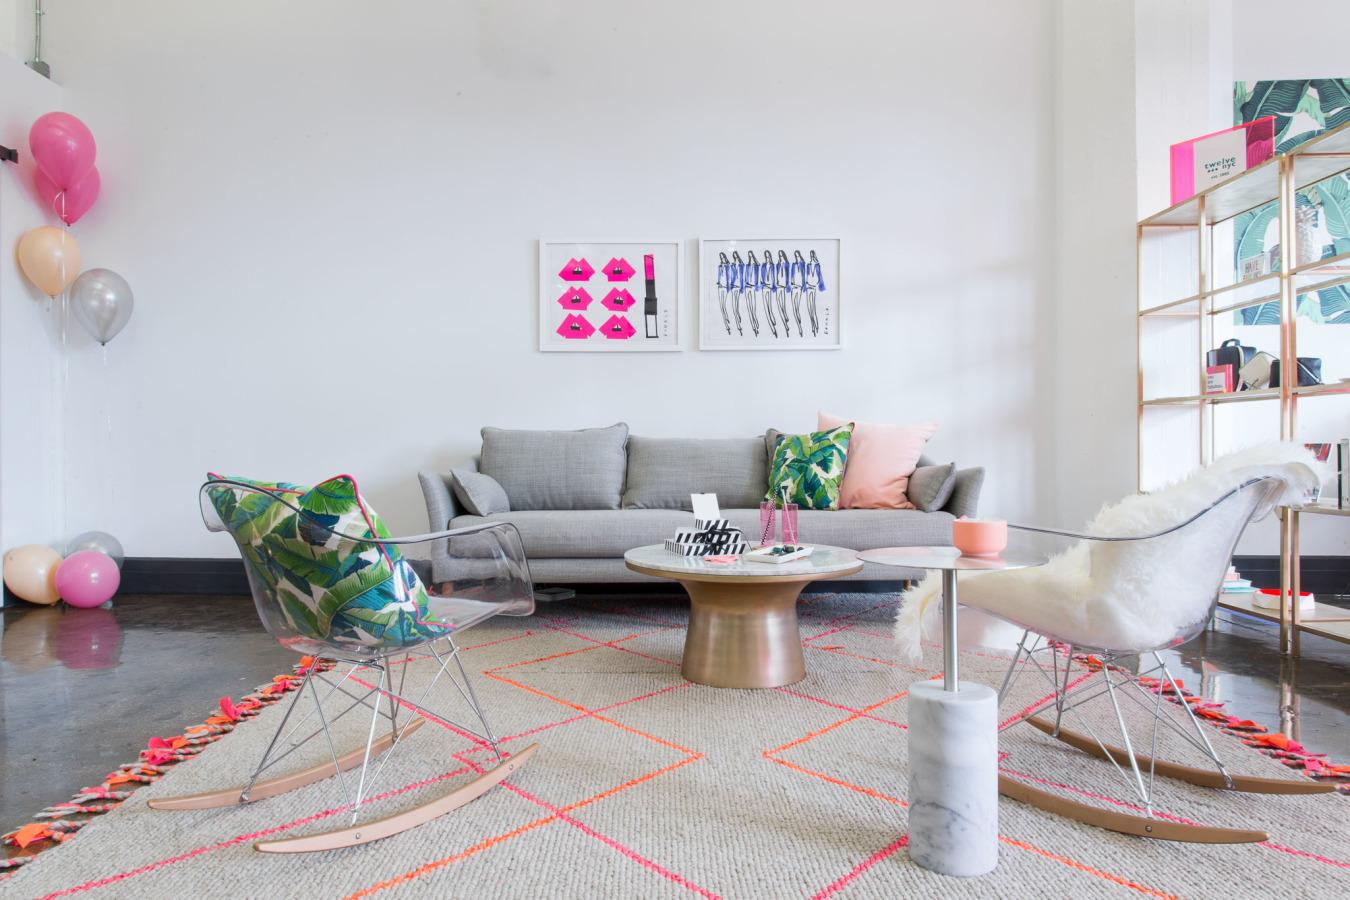 Homepolish-interior-design-300bb-1350x900.jpg